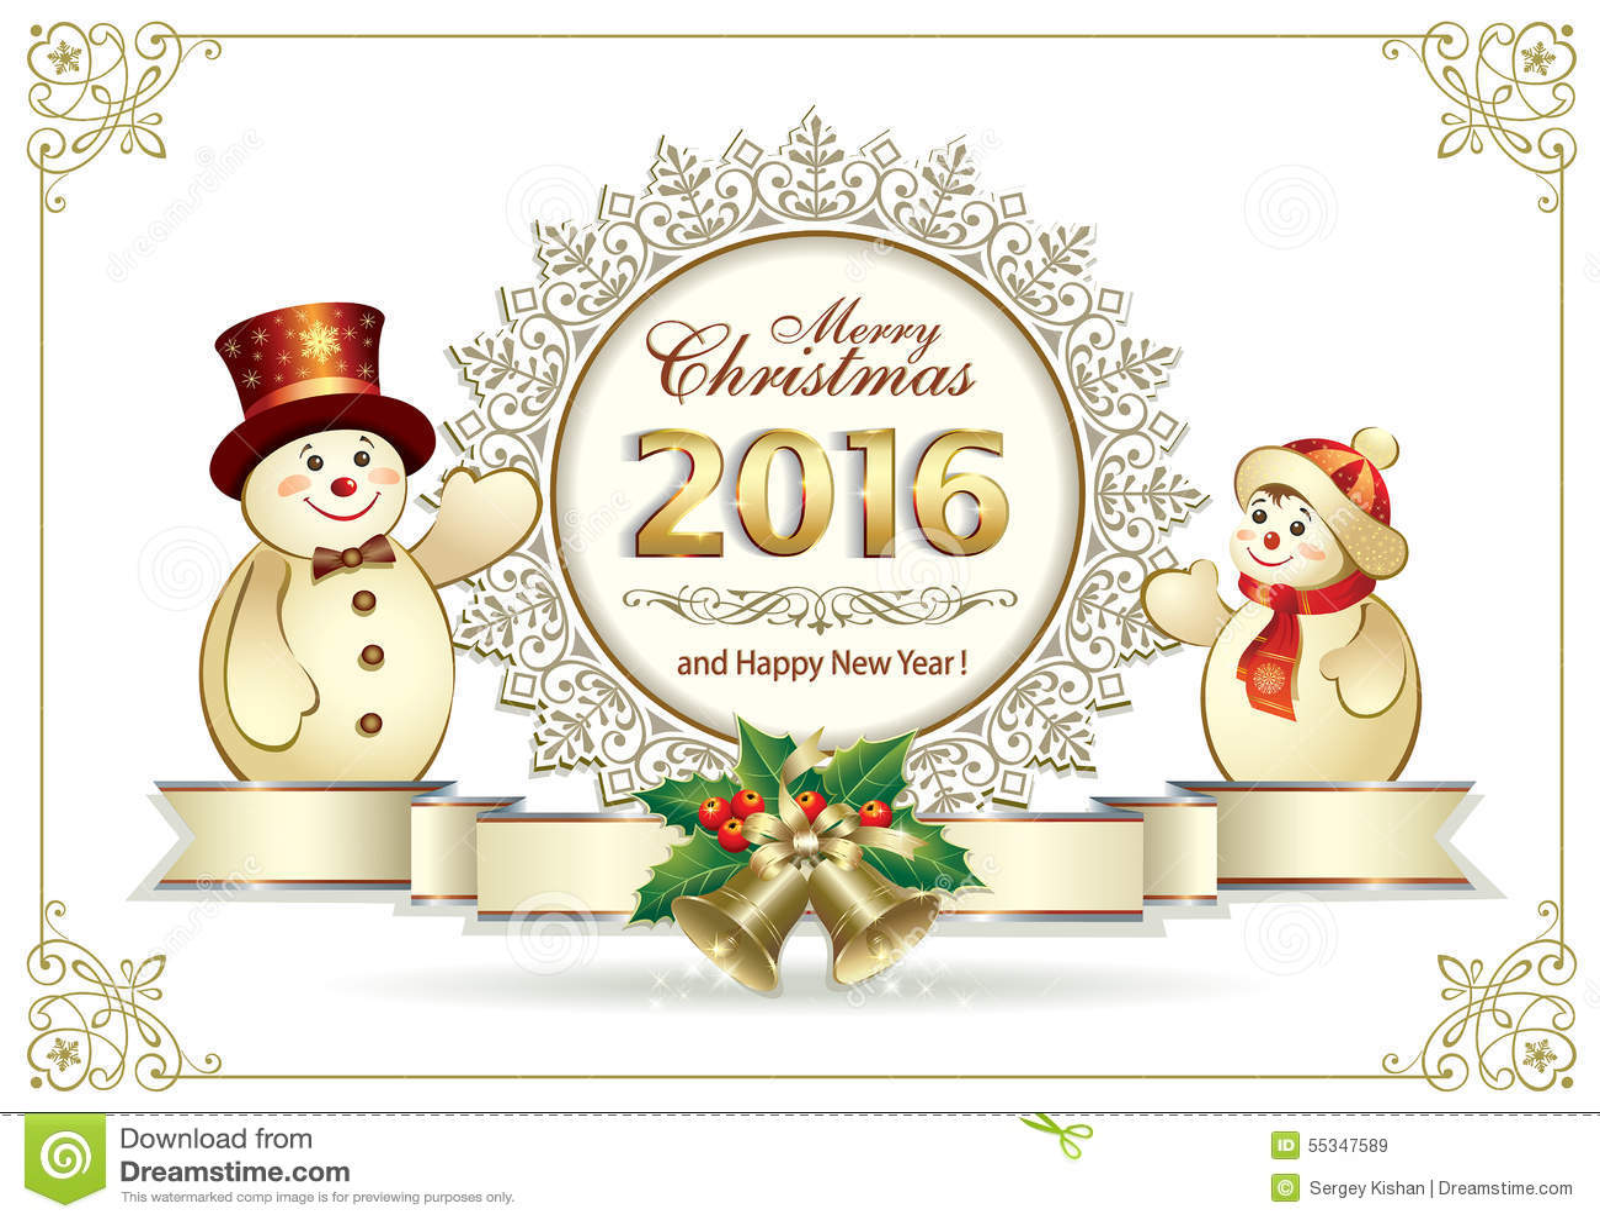 Happy New Year 2016 stock vector. Image of advertisement ...